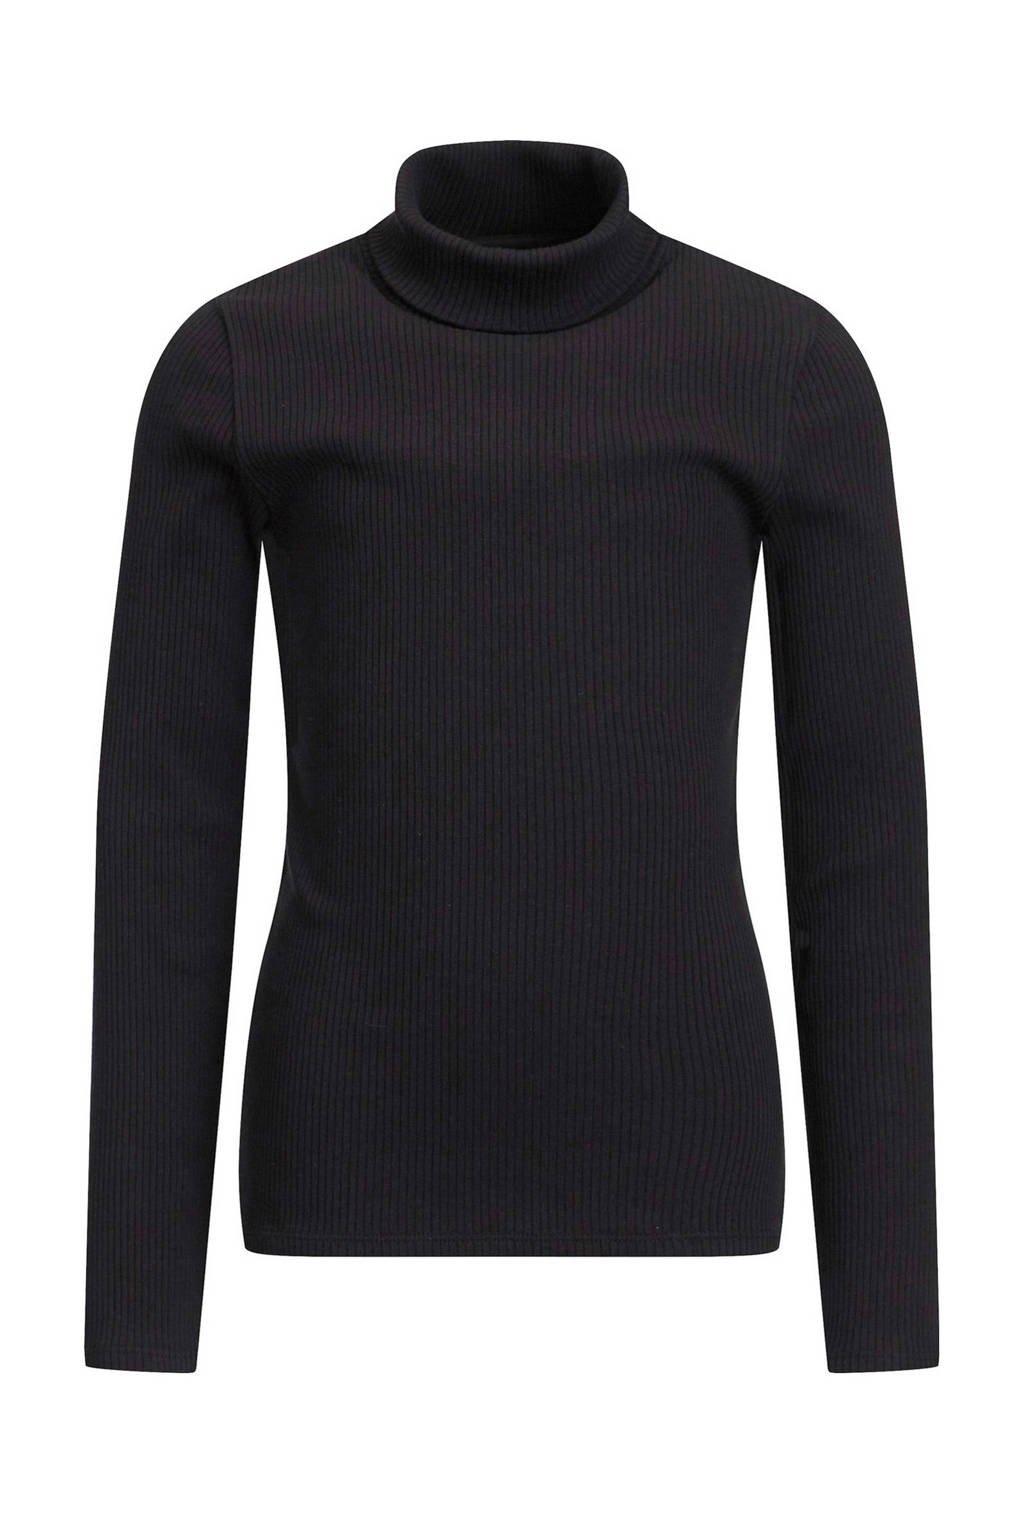 WE Fashion ribgebreide coltrui Myla zwart, Zwart